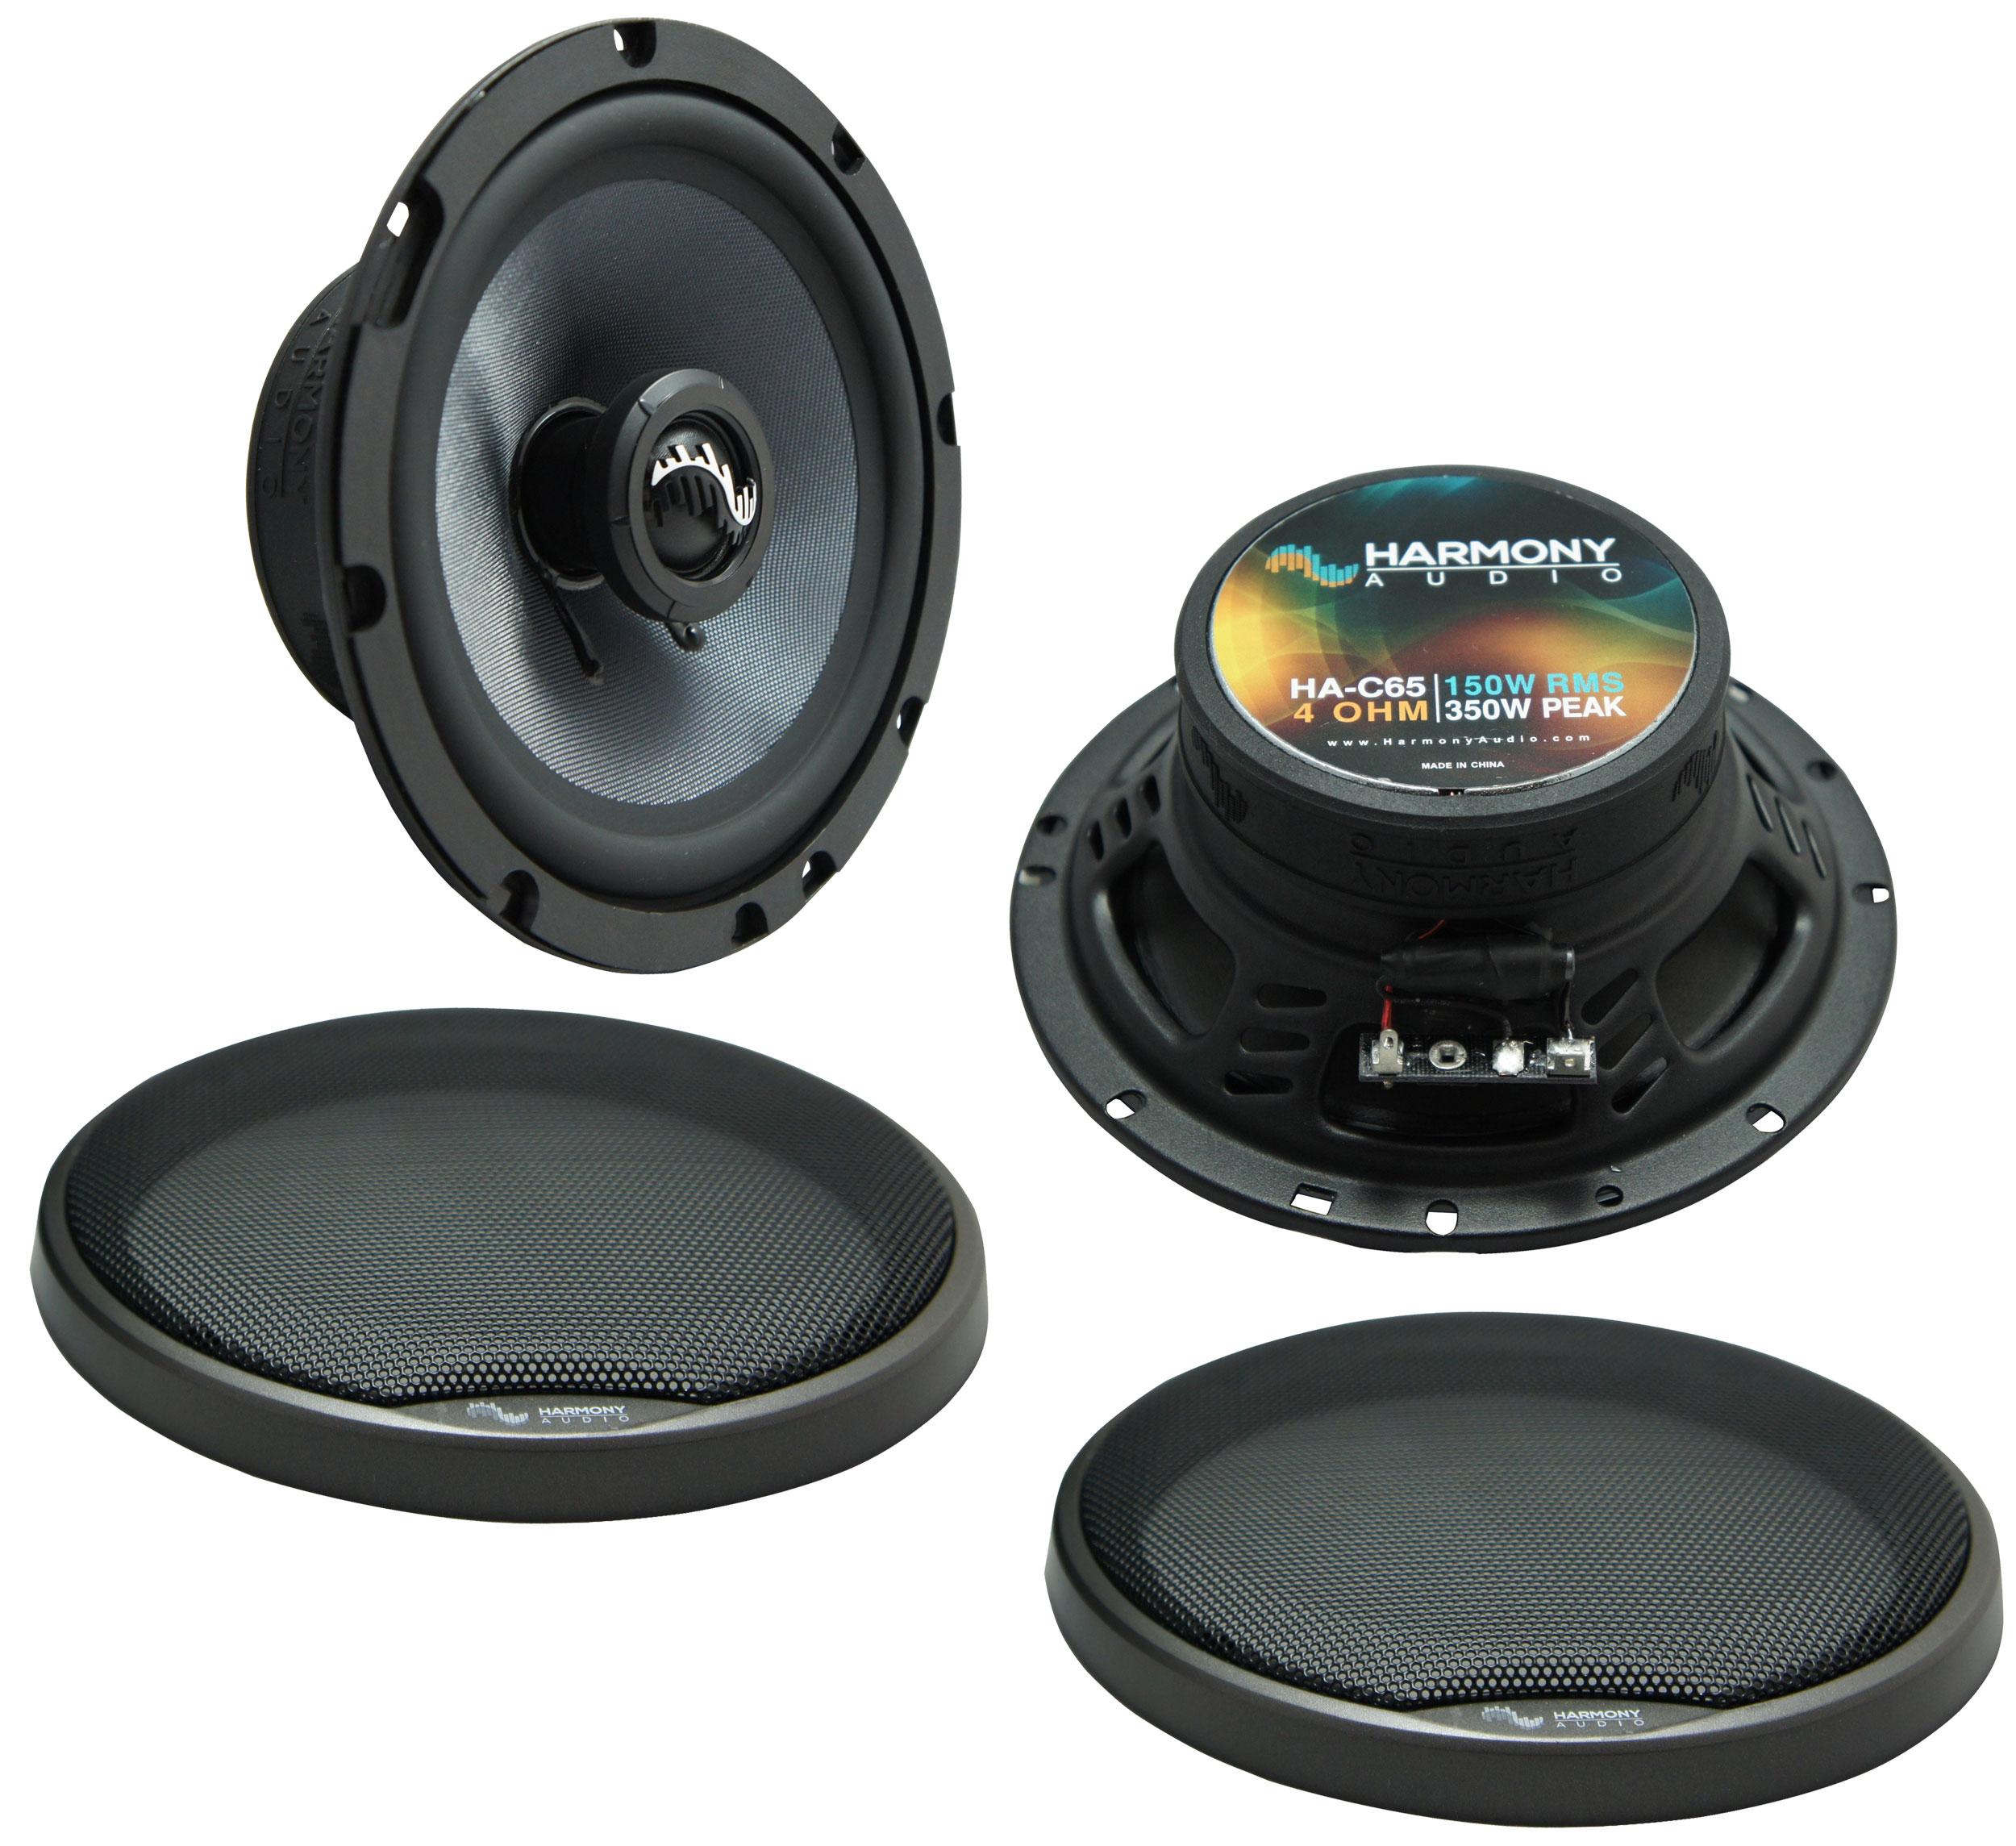 Fits Chrysler Pacifica 2004-2017 Rear Door Replacement Harmony HA-C65 Premium Speakers